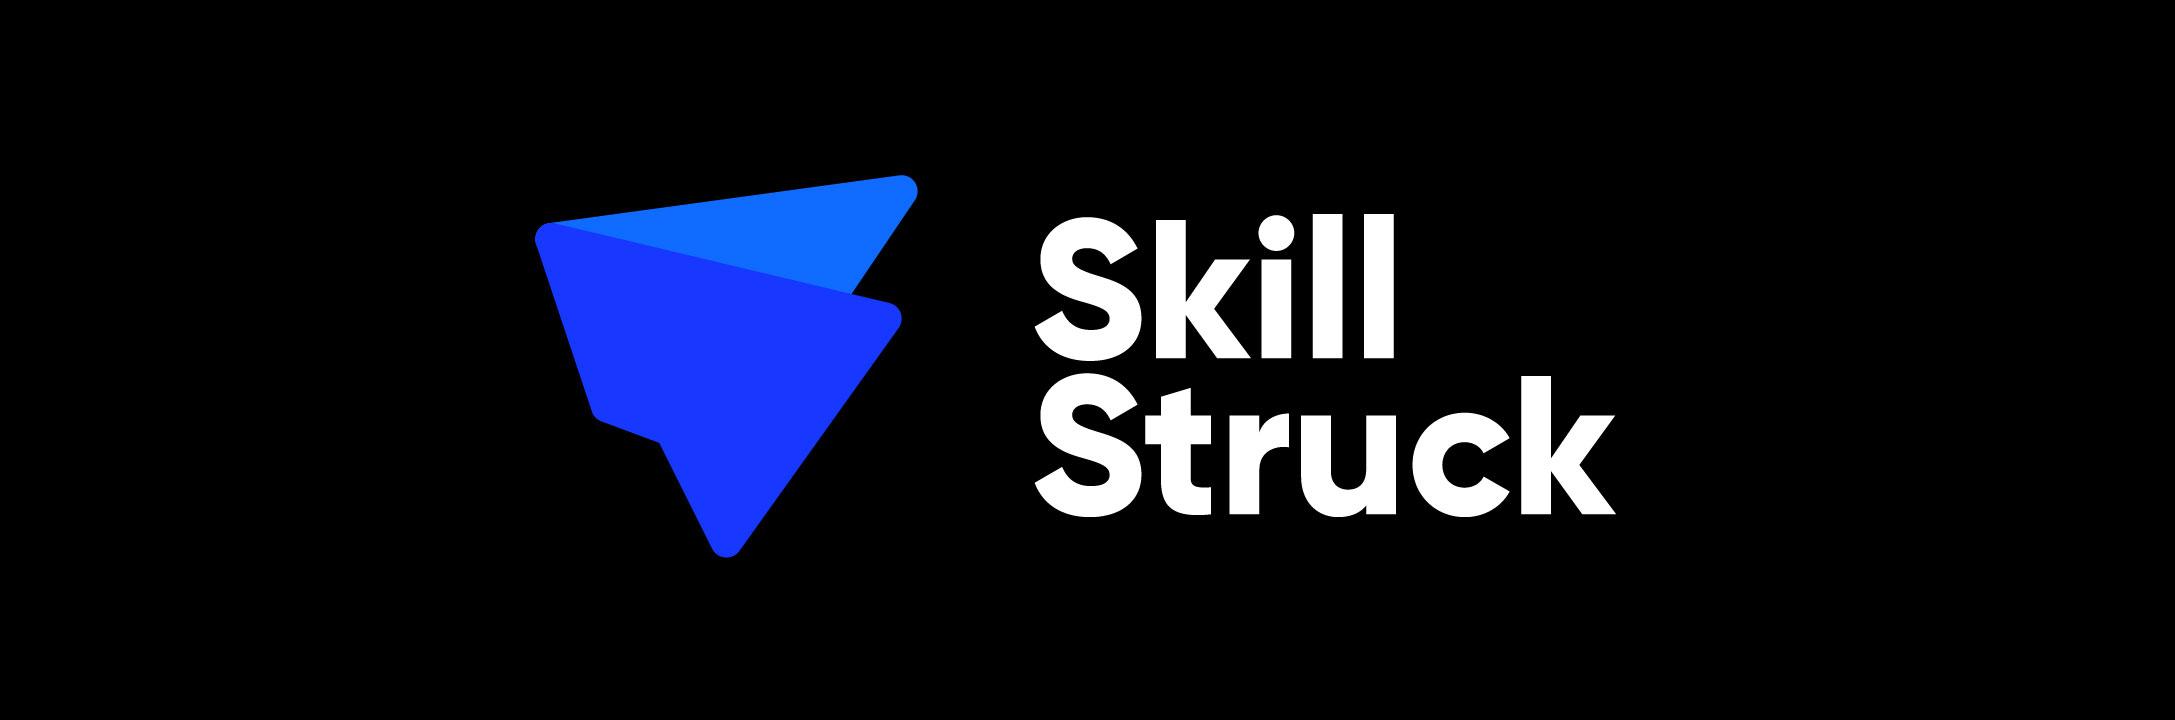 Skill Struck's new brand